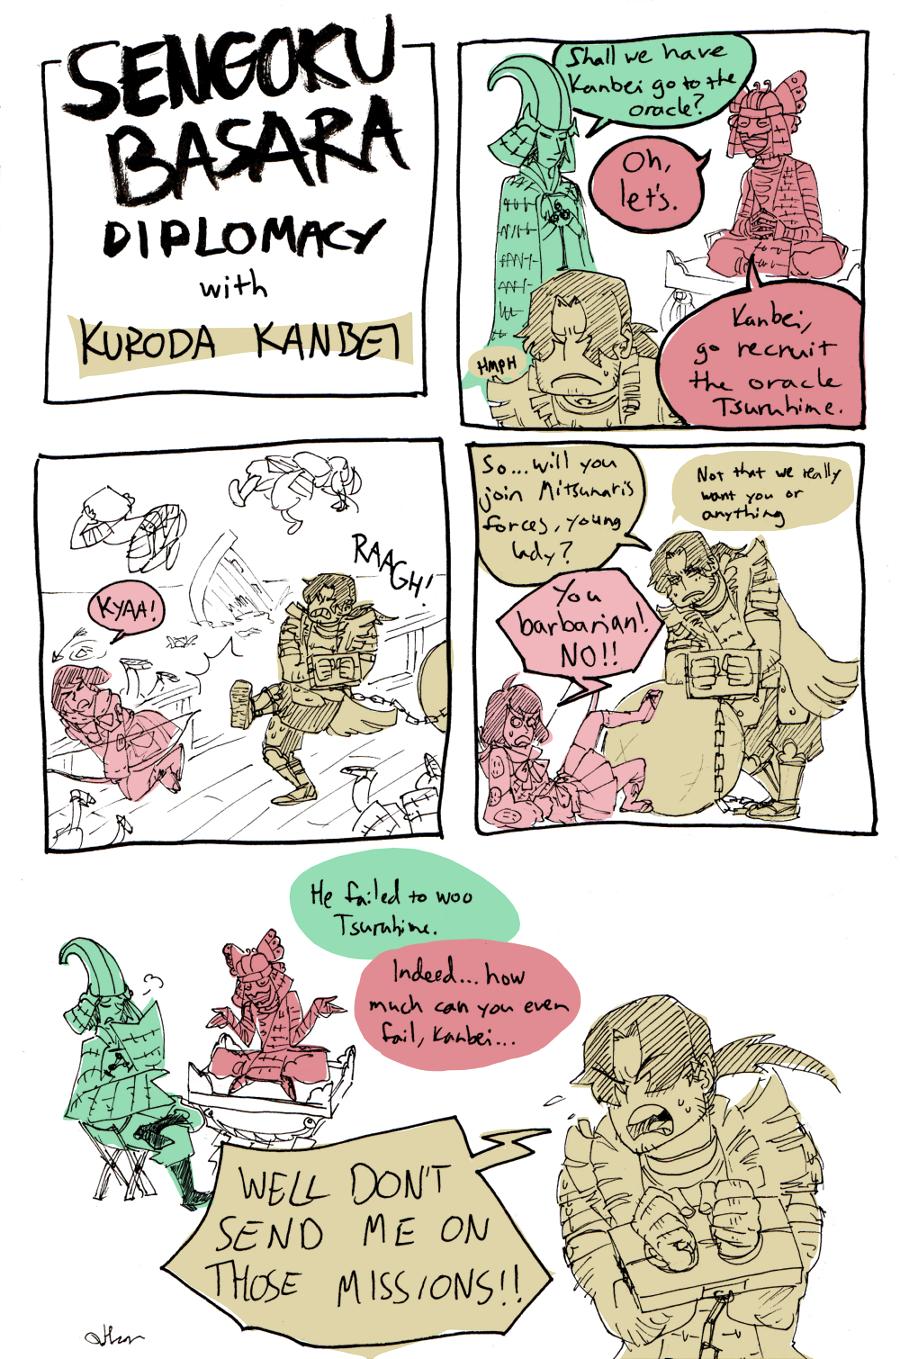 Sengoku Basara Diplomacy by Raakelh